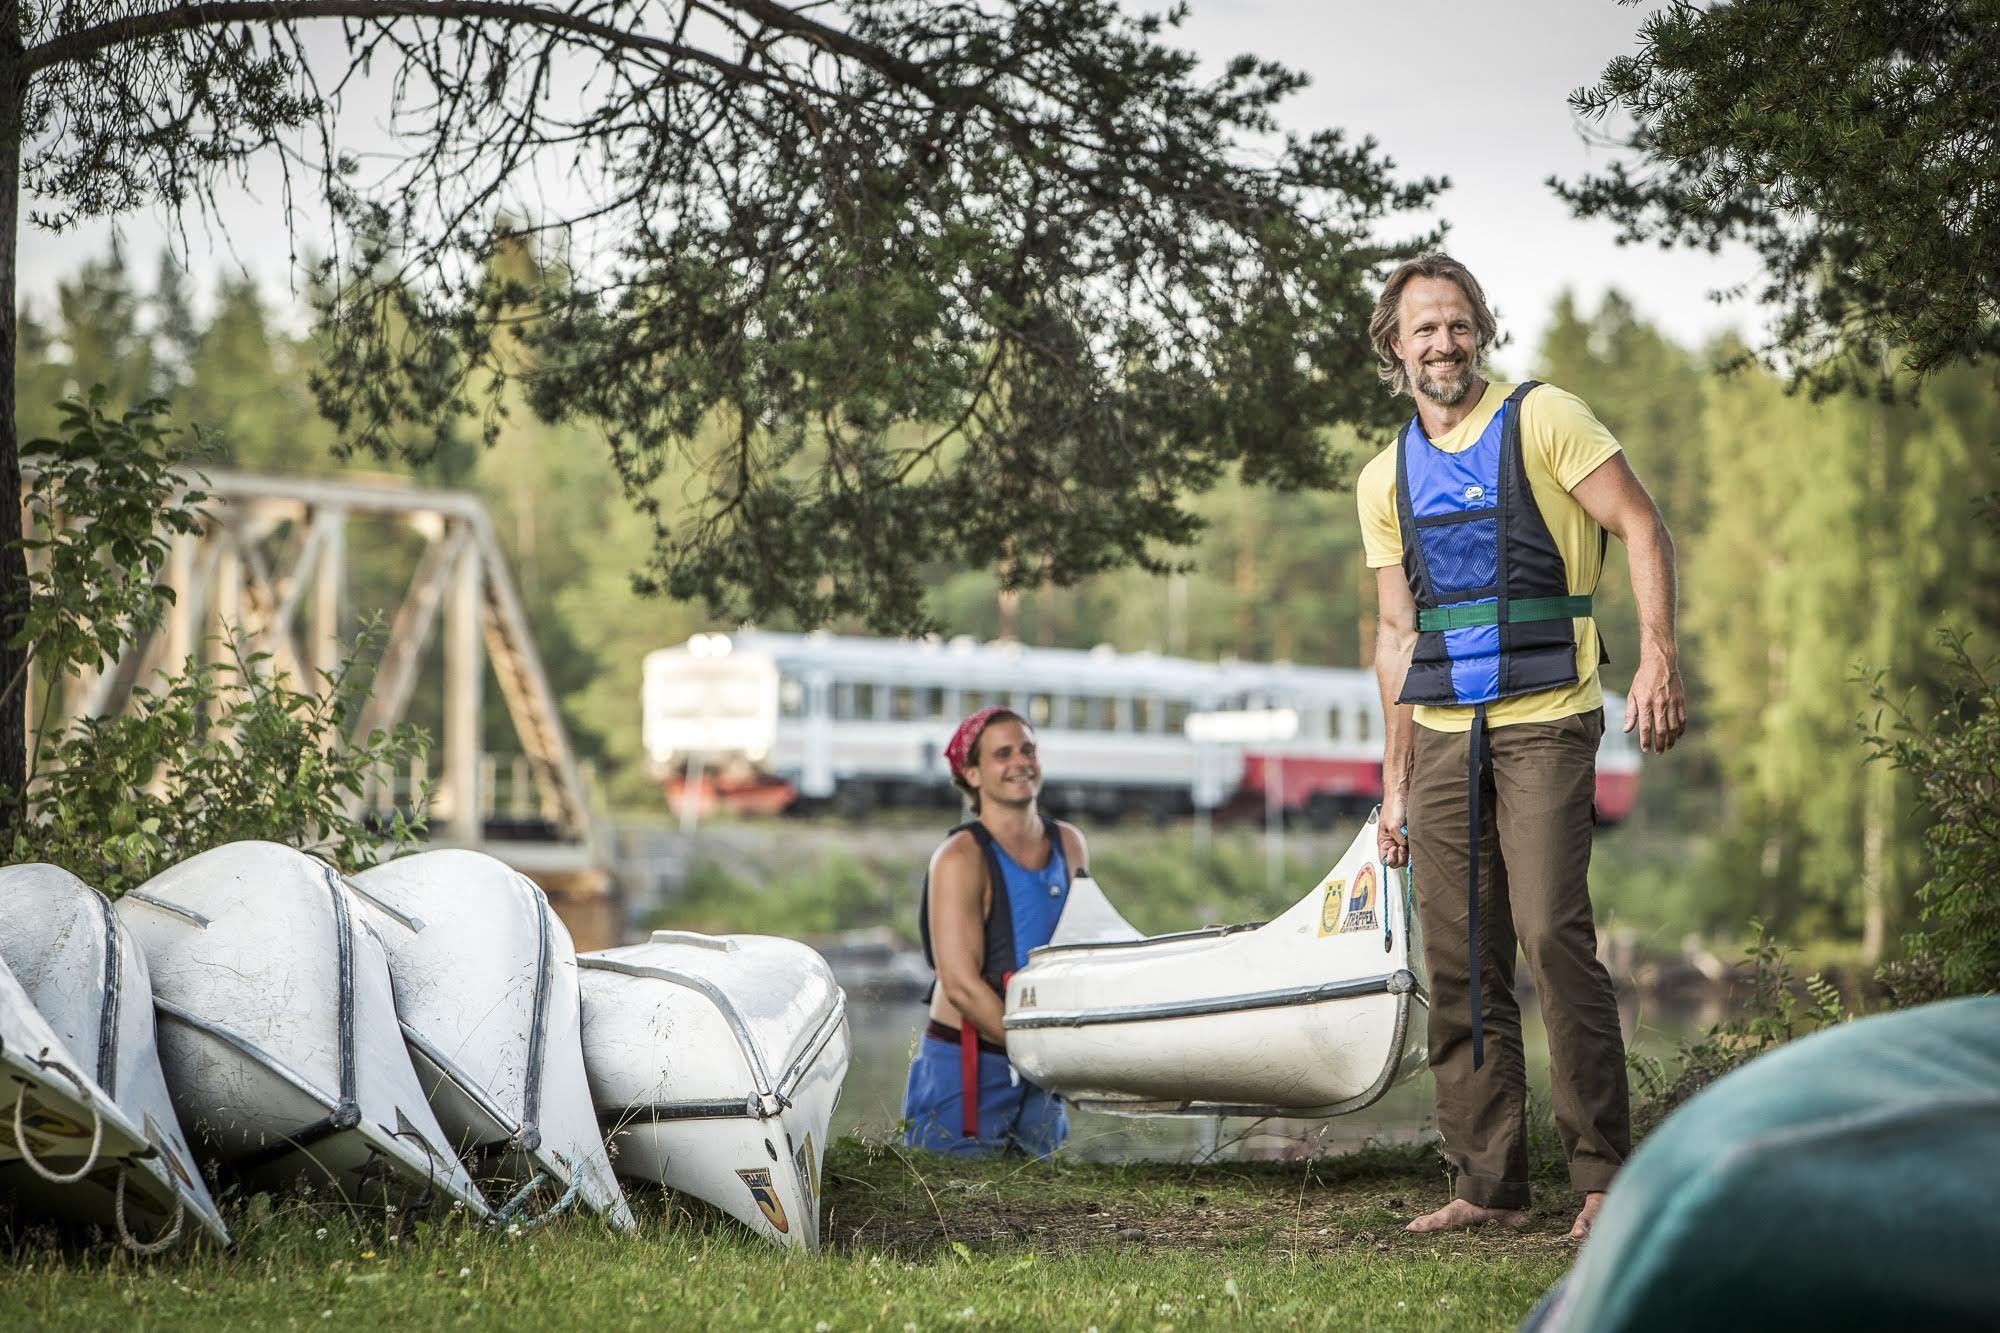 Foto: Håkan Wike,  © Copy:Lits Camping, Kanoter ner vid älven